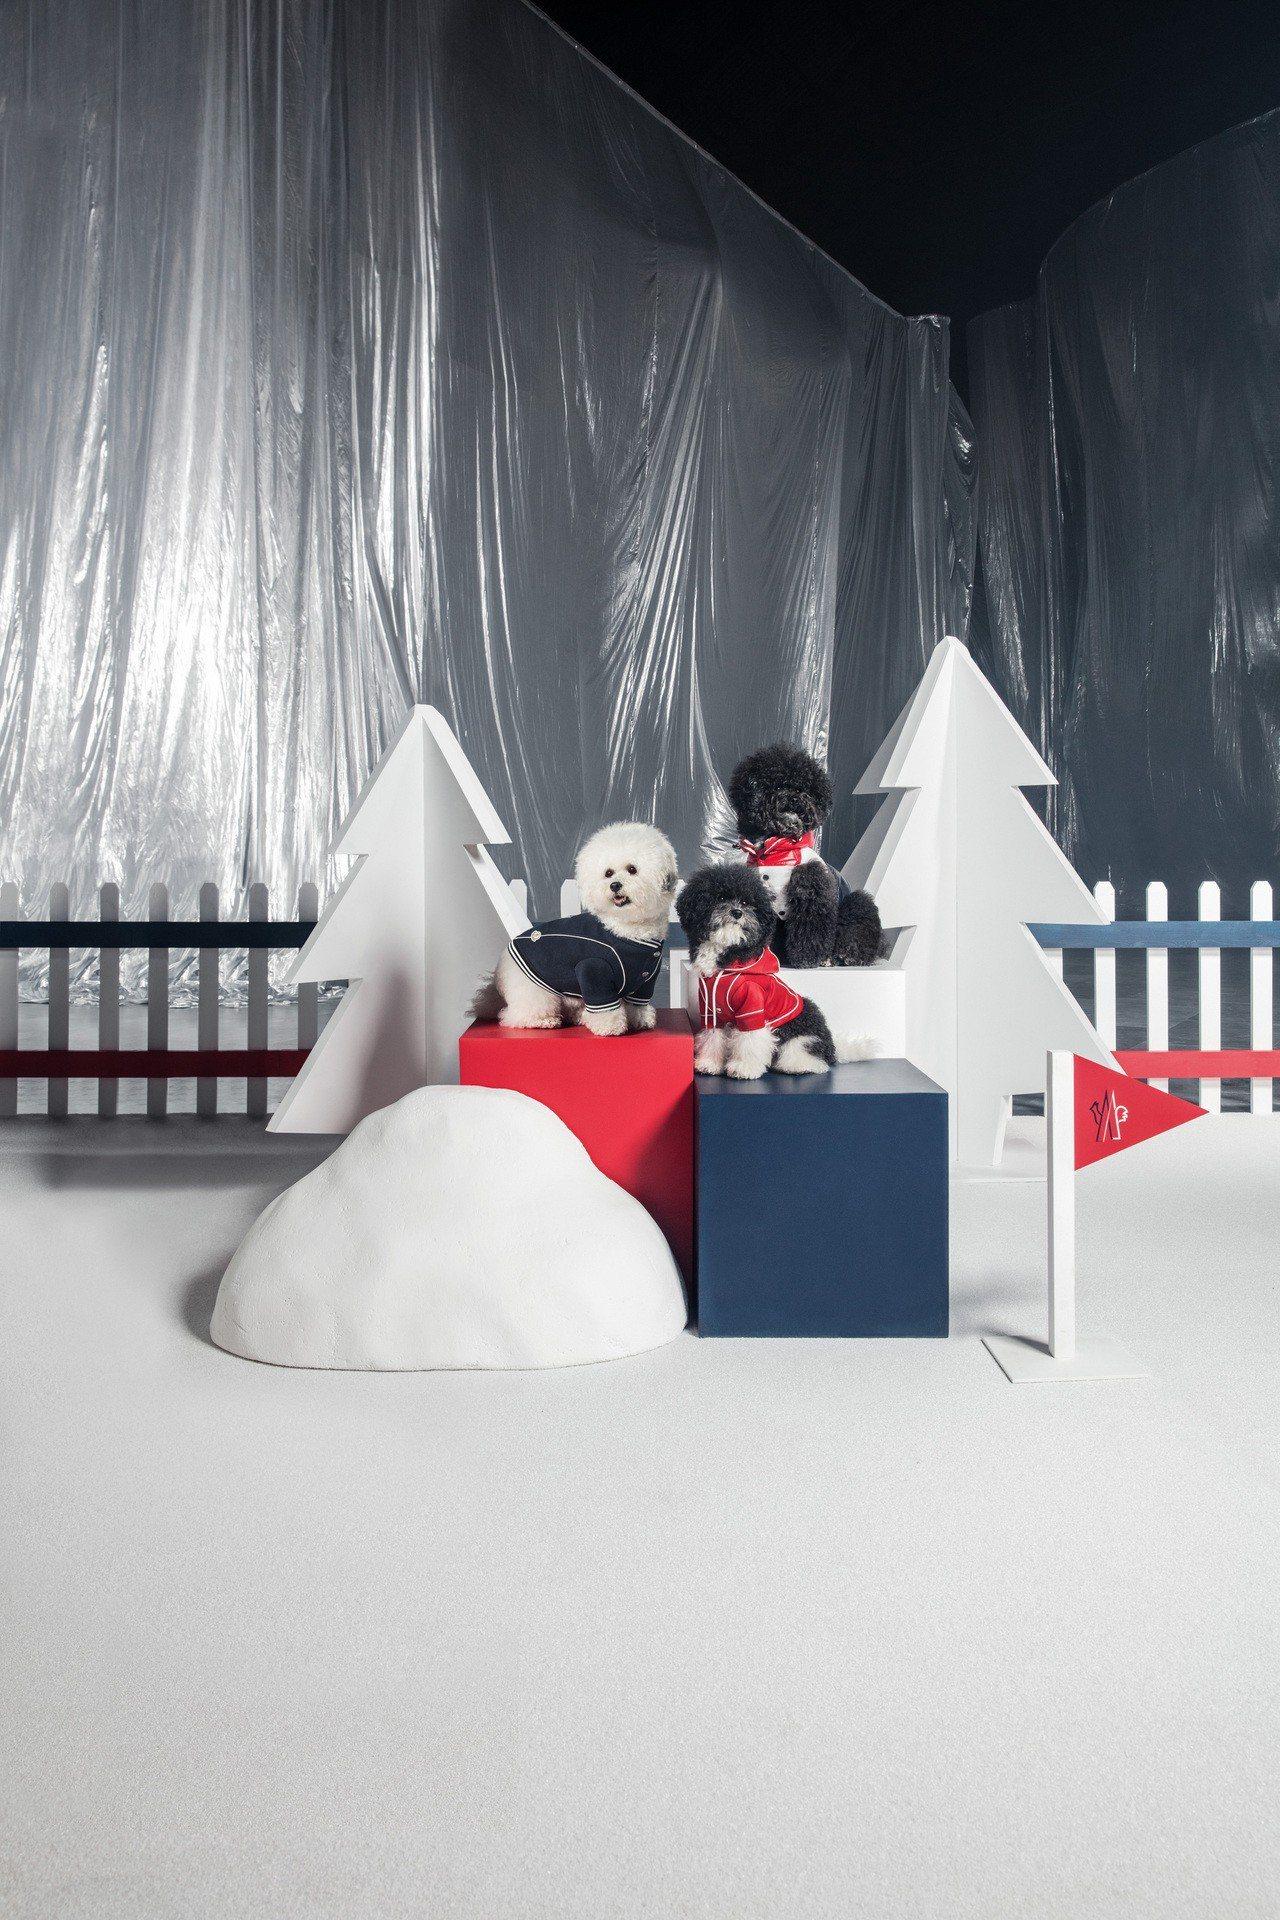 MONCLER Poldo Dog Couture愛犬訂製服系列推出可雙面穿的紅...